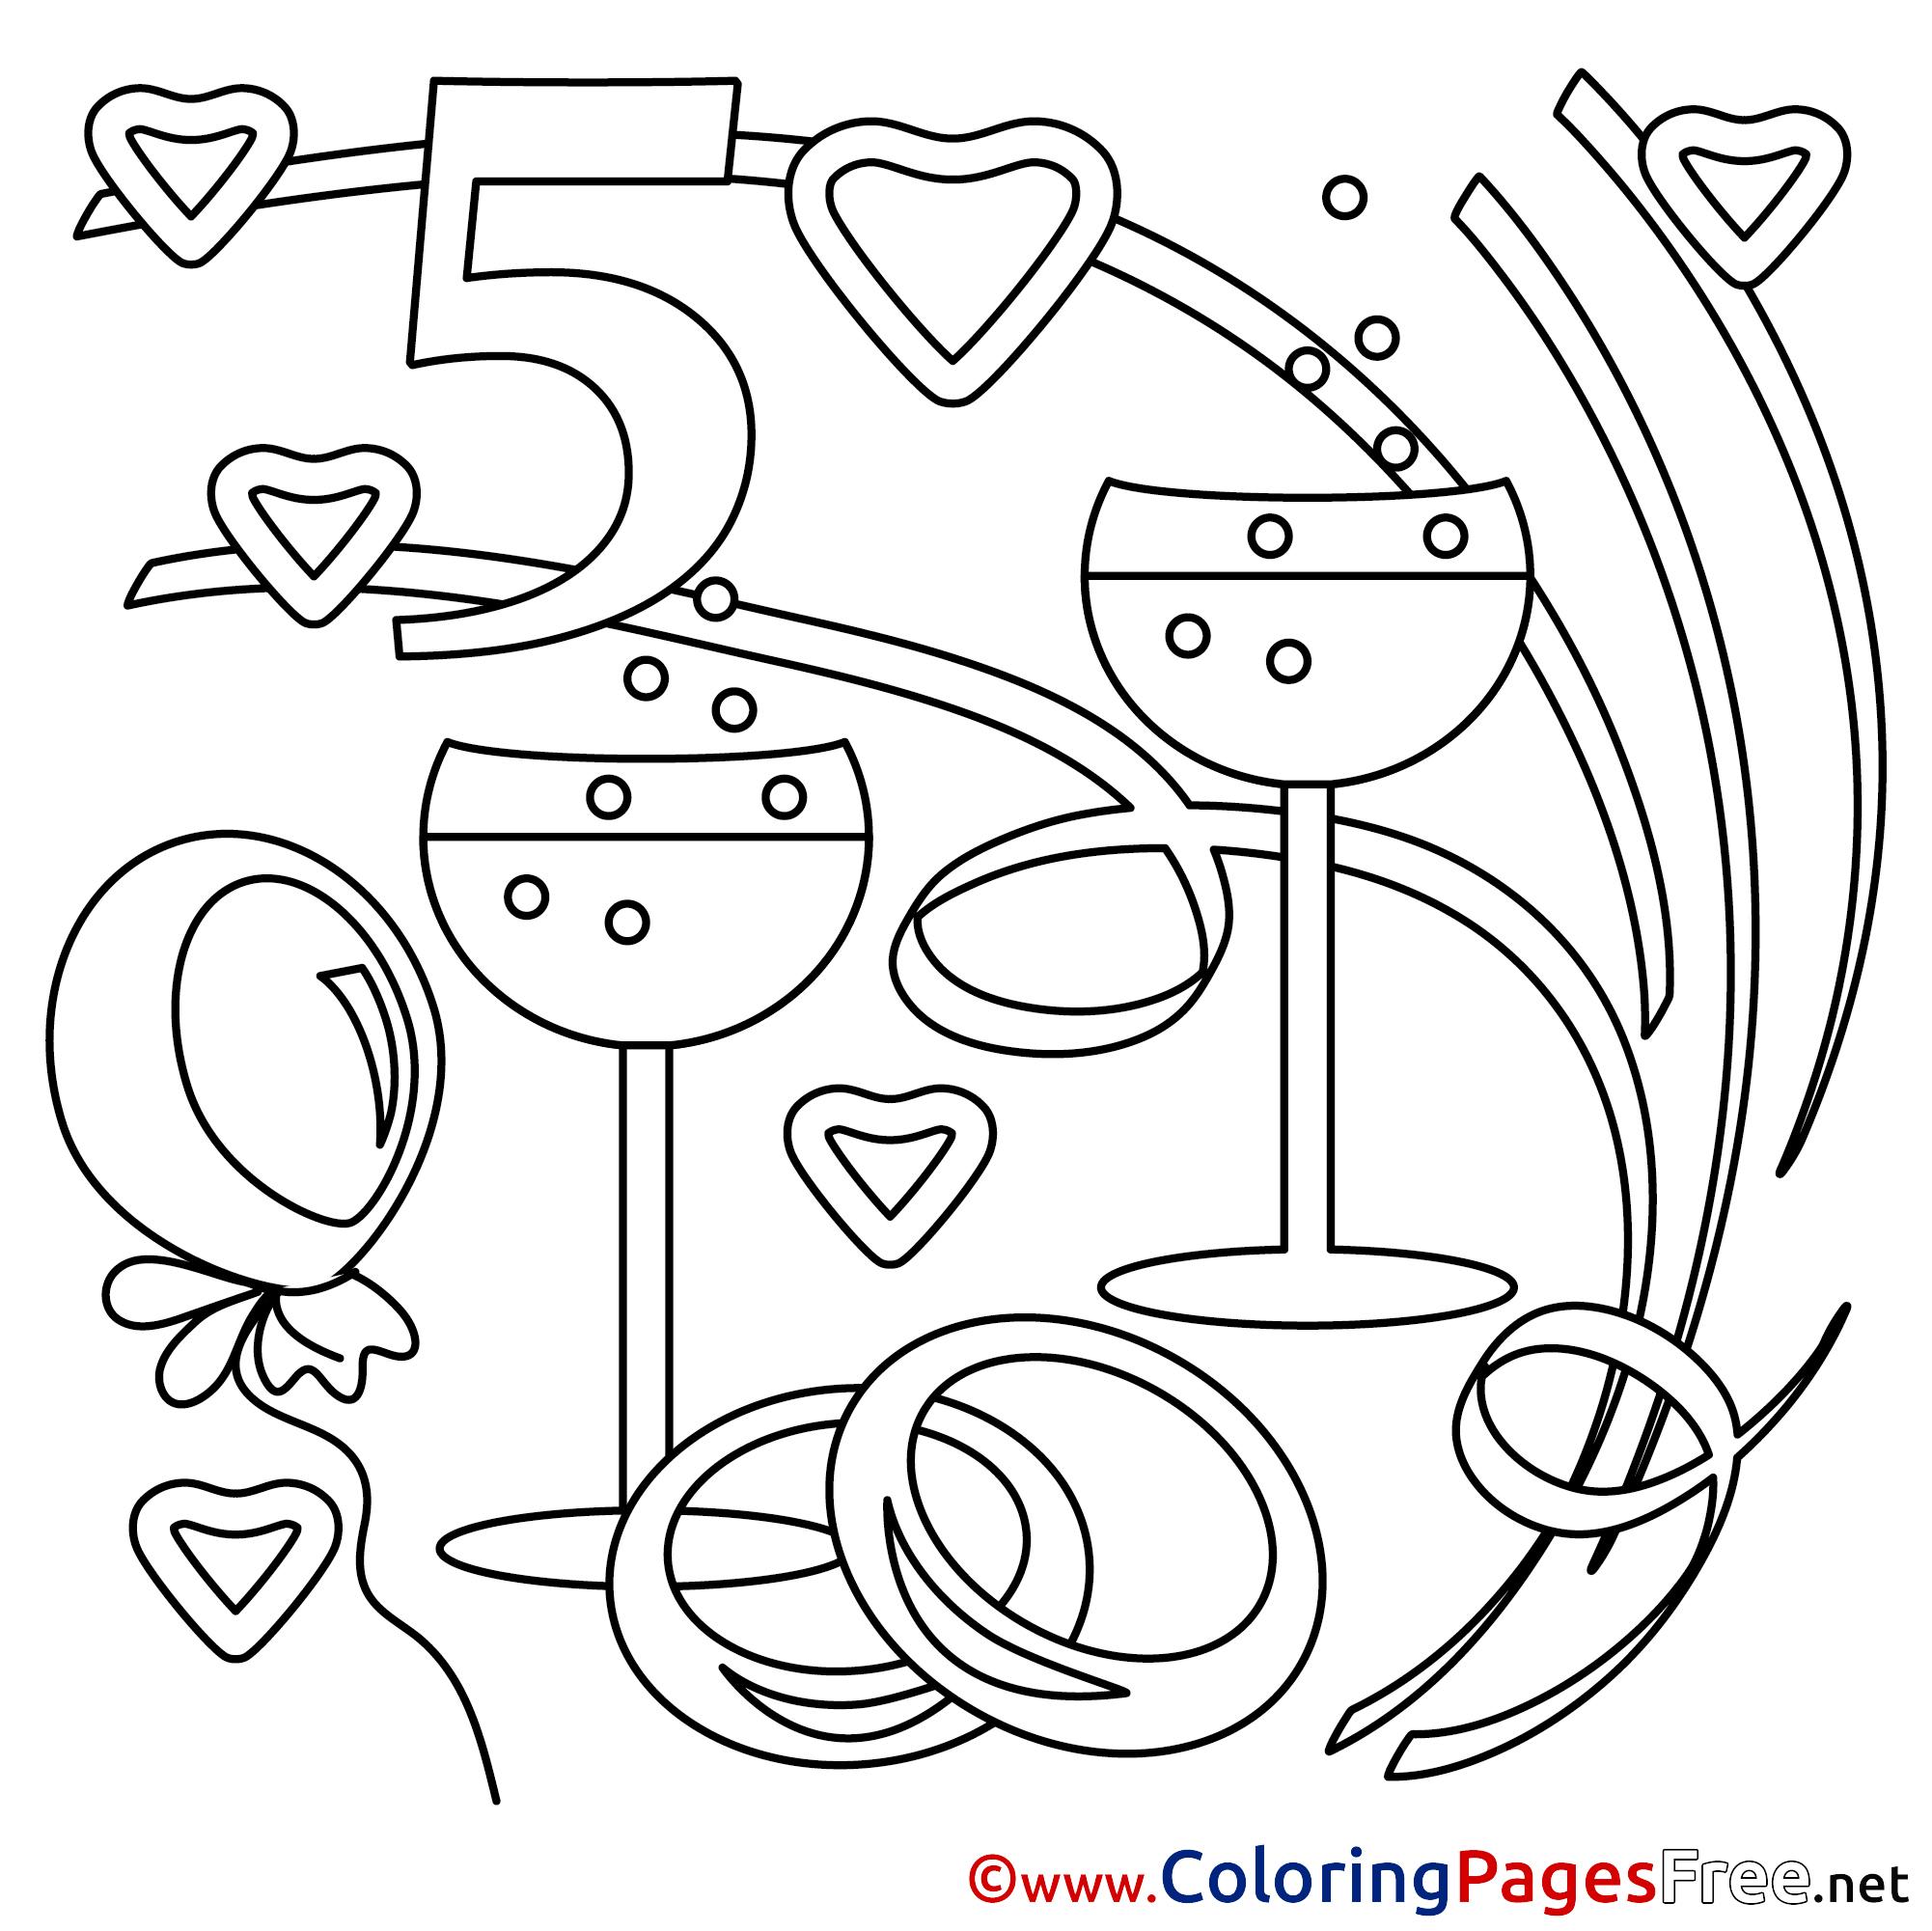 Printable coloring sheets wedding - Printable Coloring Sheets Wedding 38